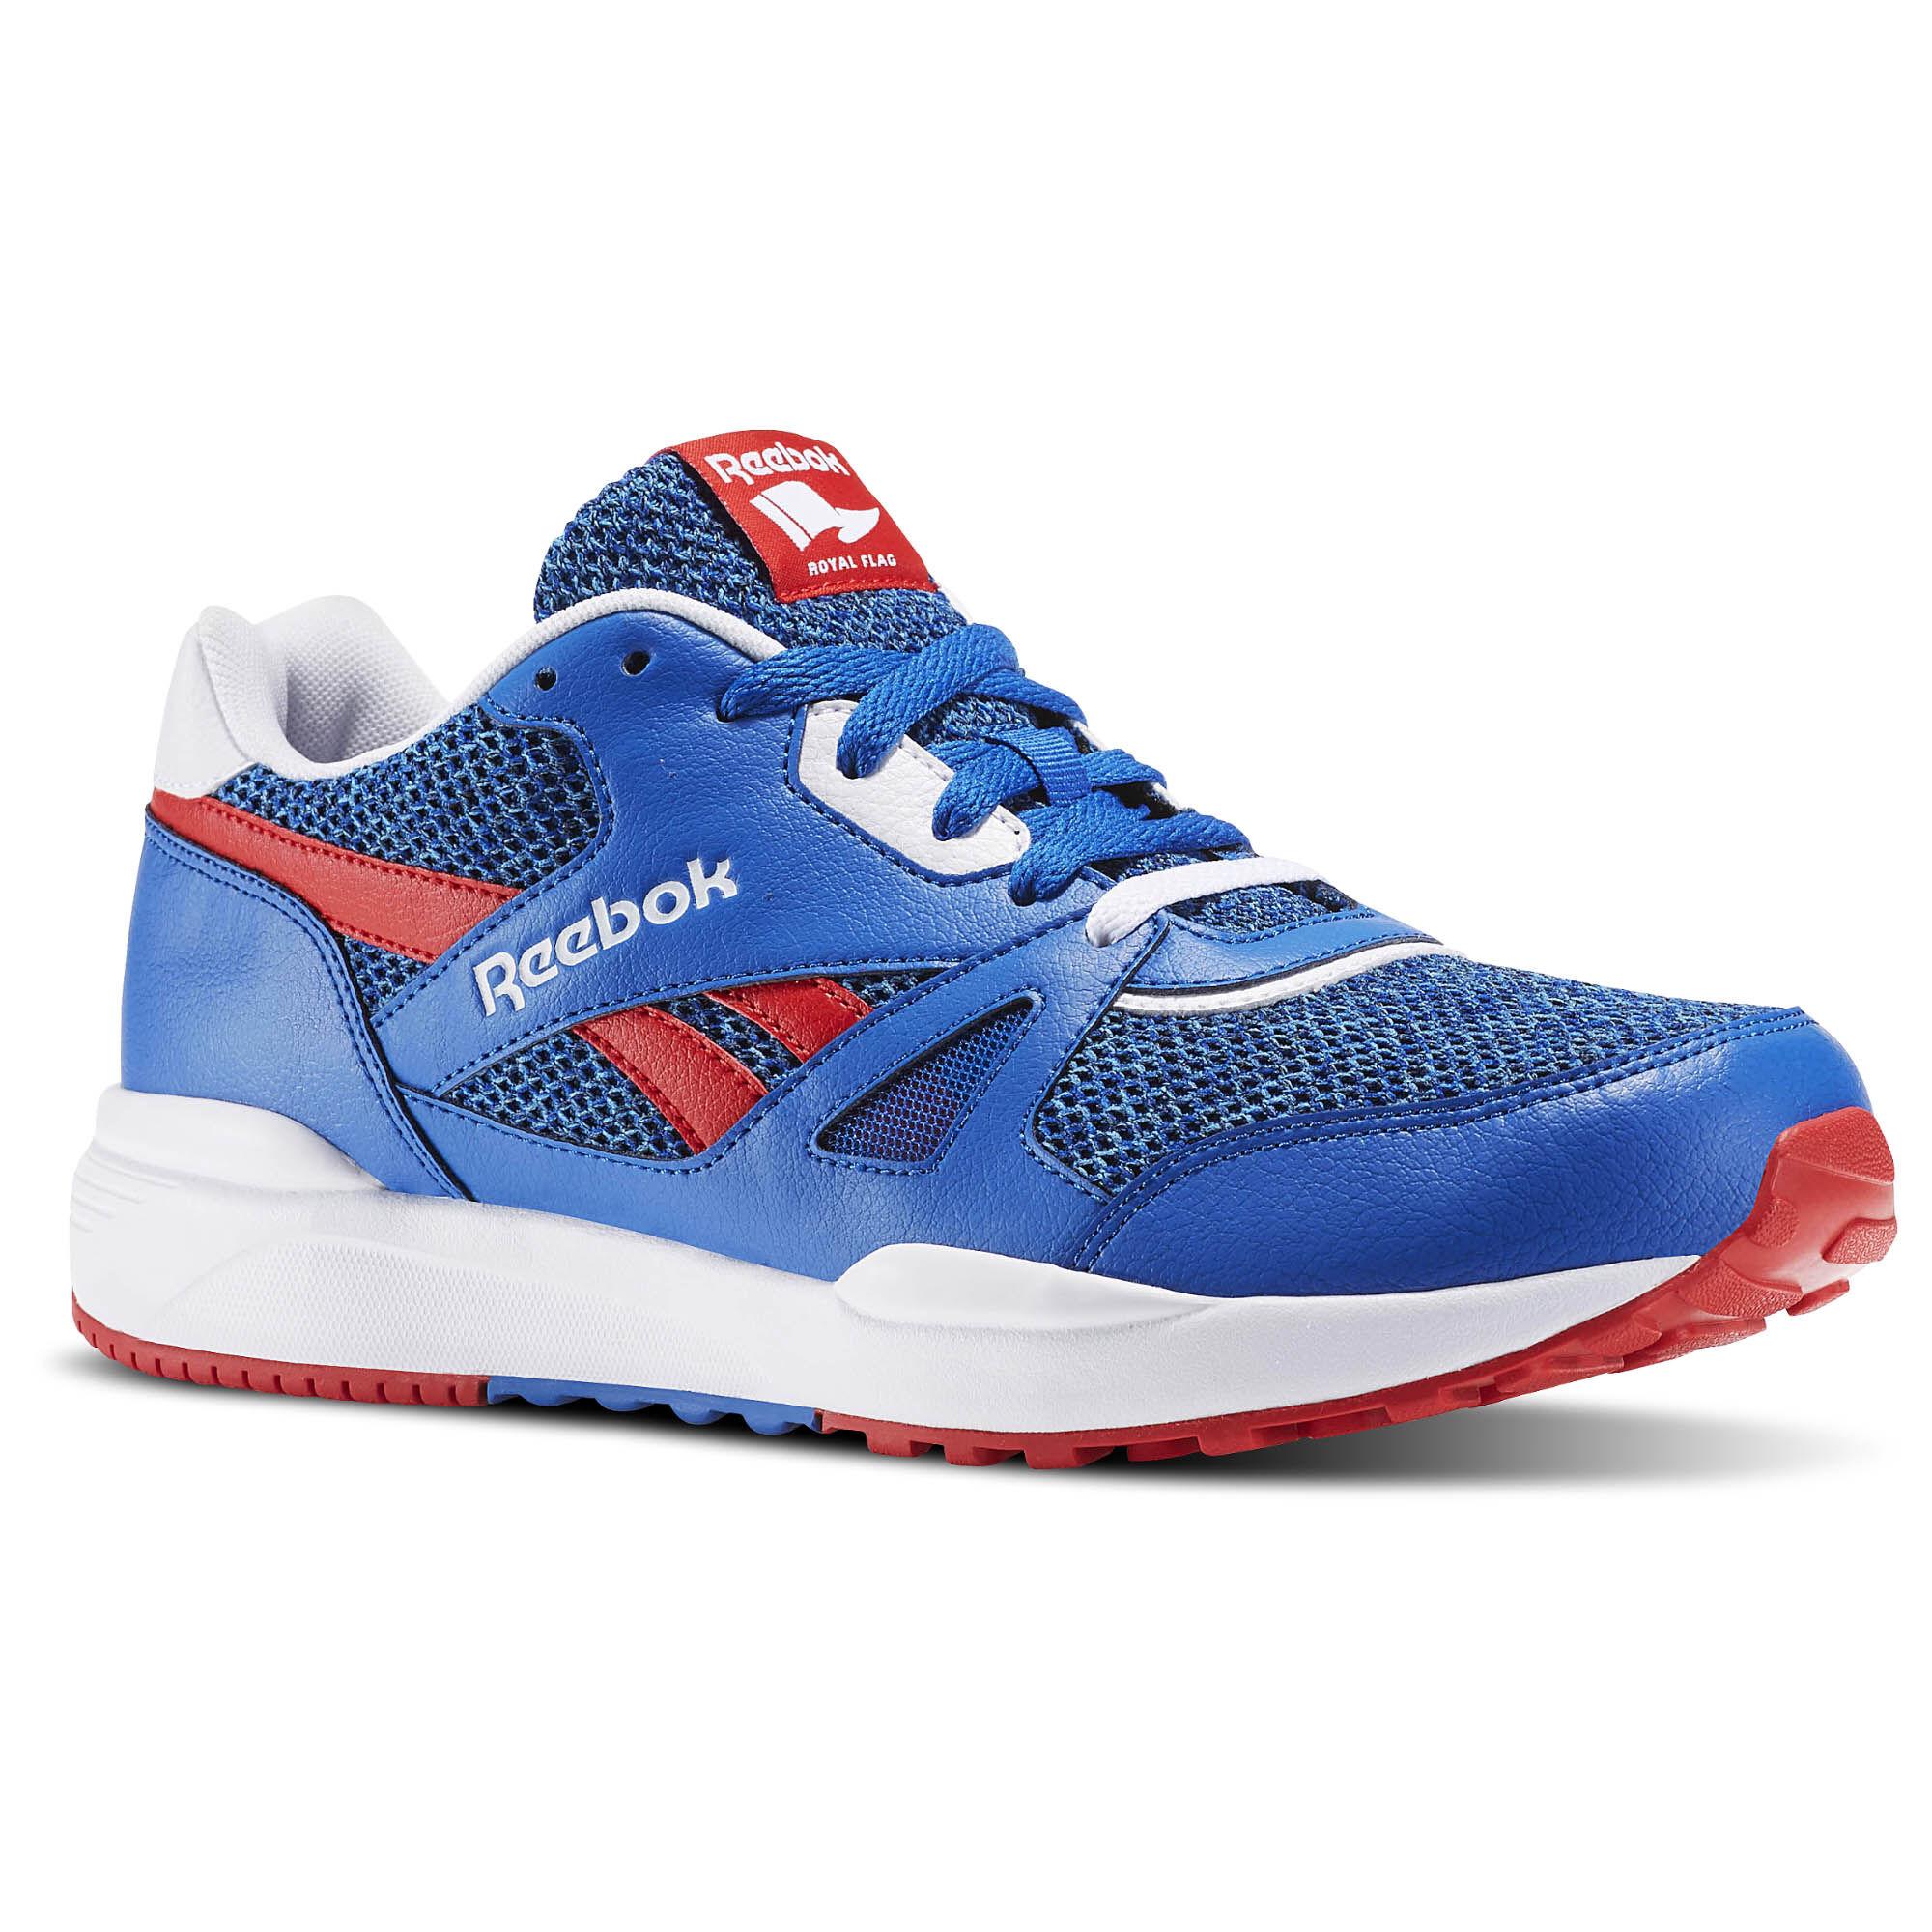 2013 Vqzqy Nuevos Zapatos Cadqdp Reebok Modelos De w7qnEpX7d